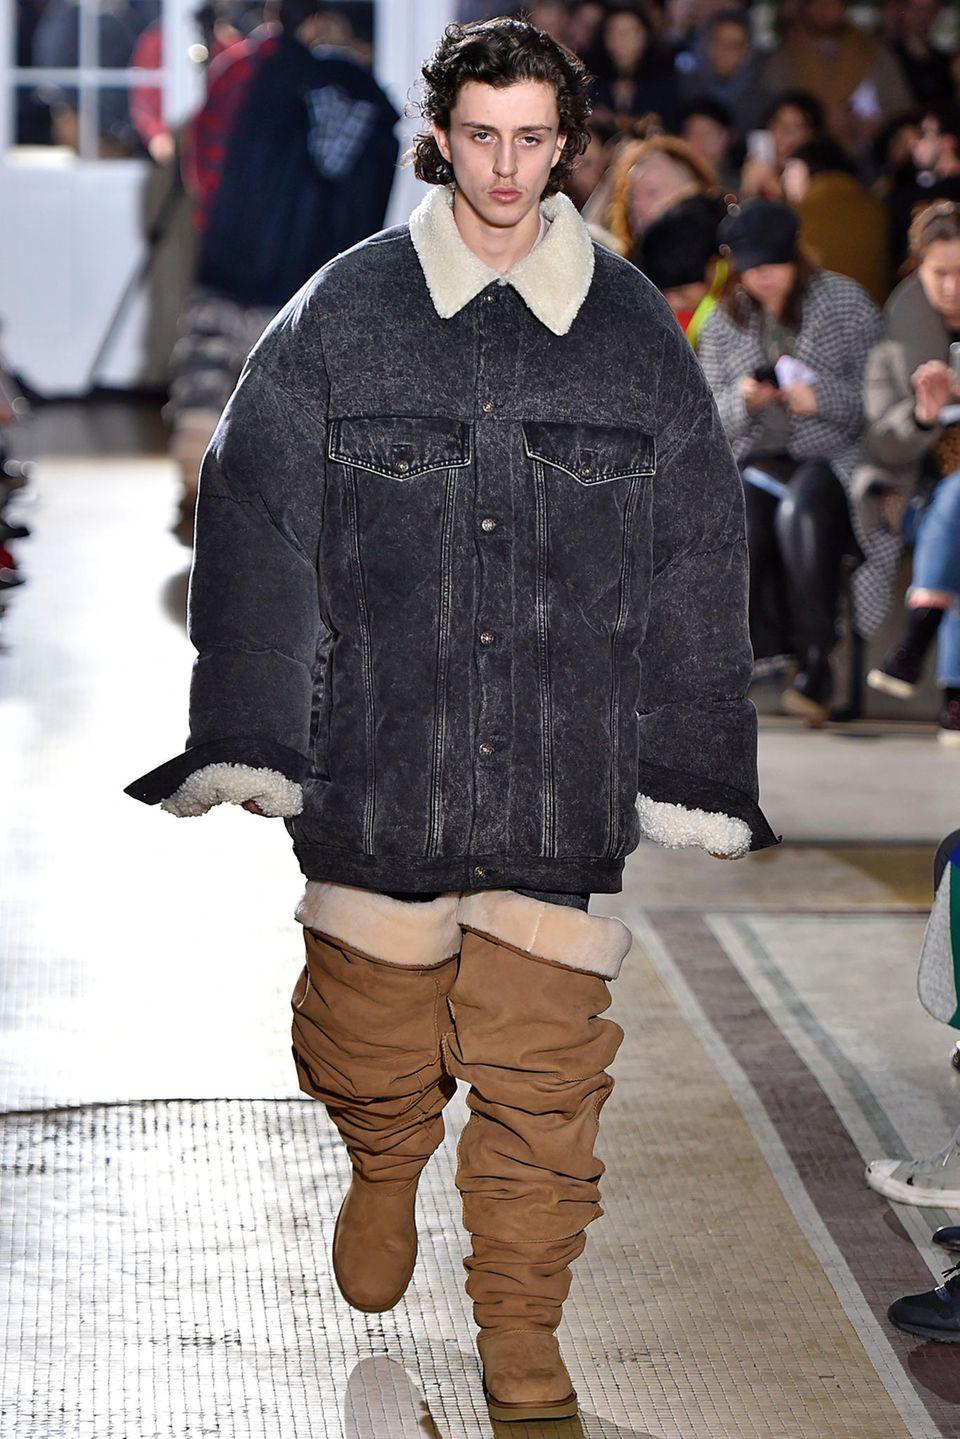 Modell trägt Overknees von UGG